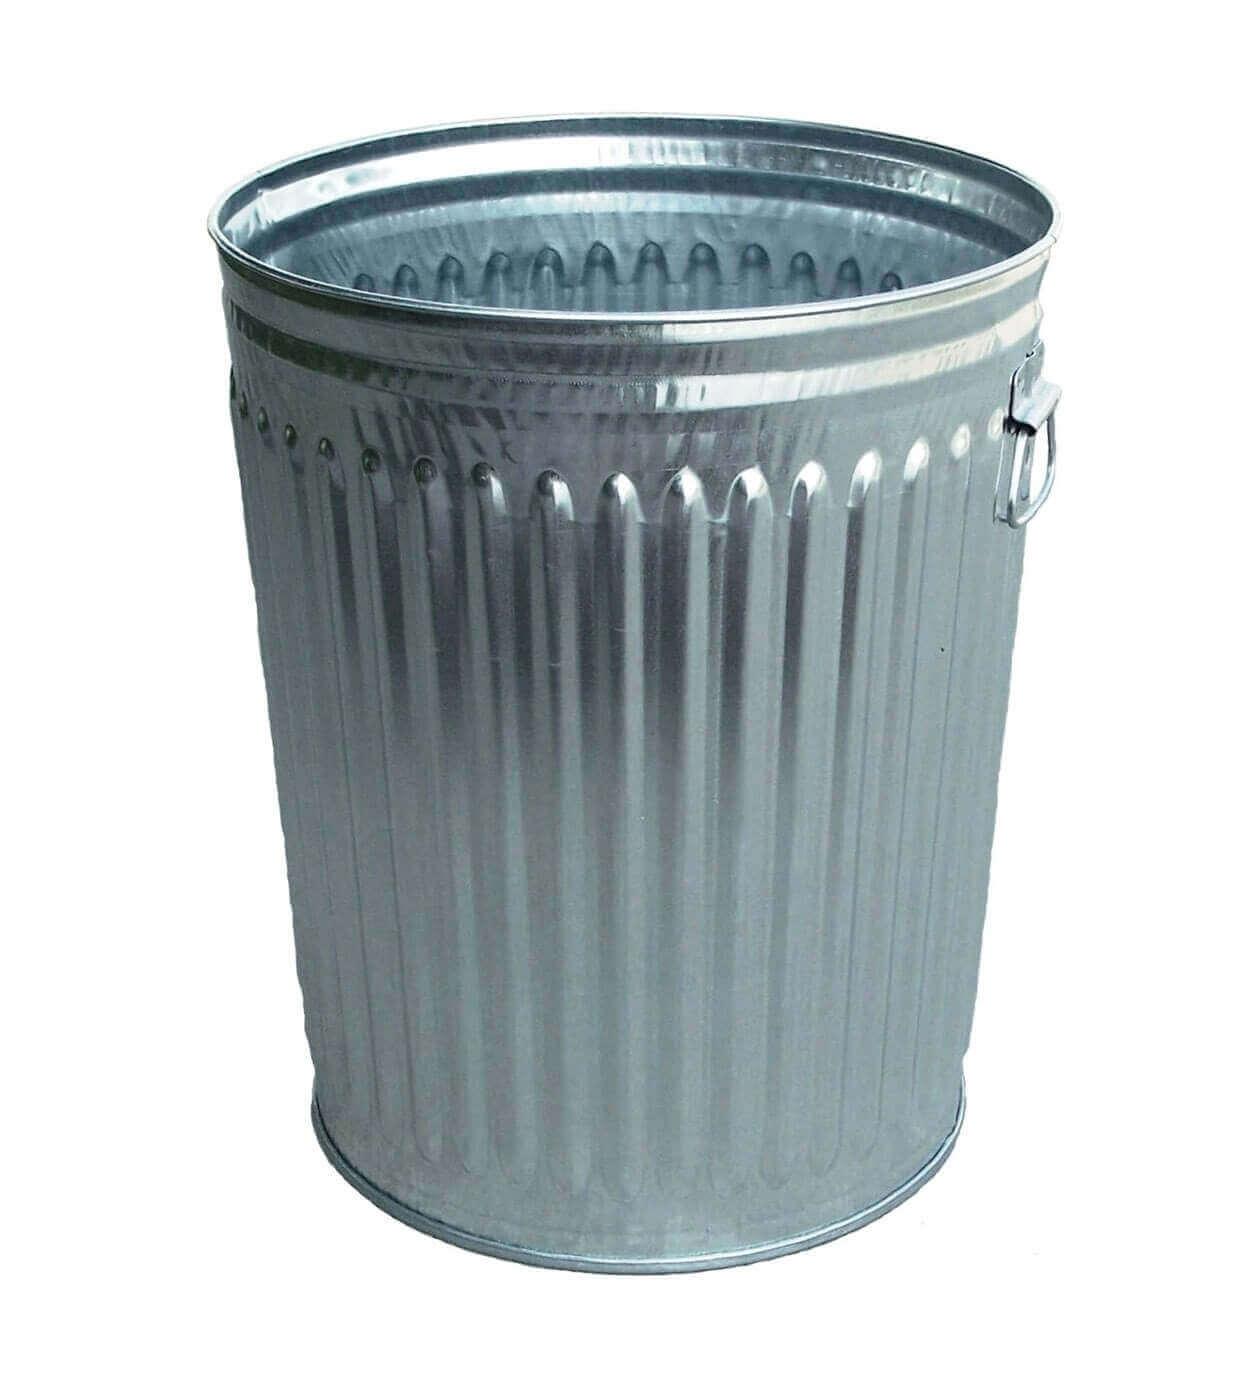 24 Gallon 23 Gauge Galvanized Steel Trash Can W Flat Top